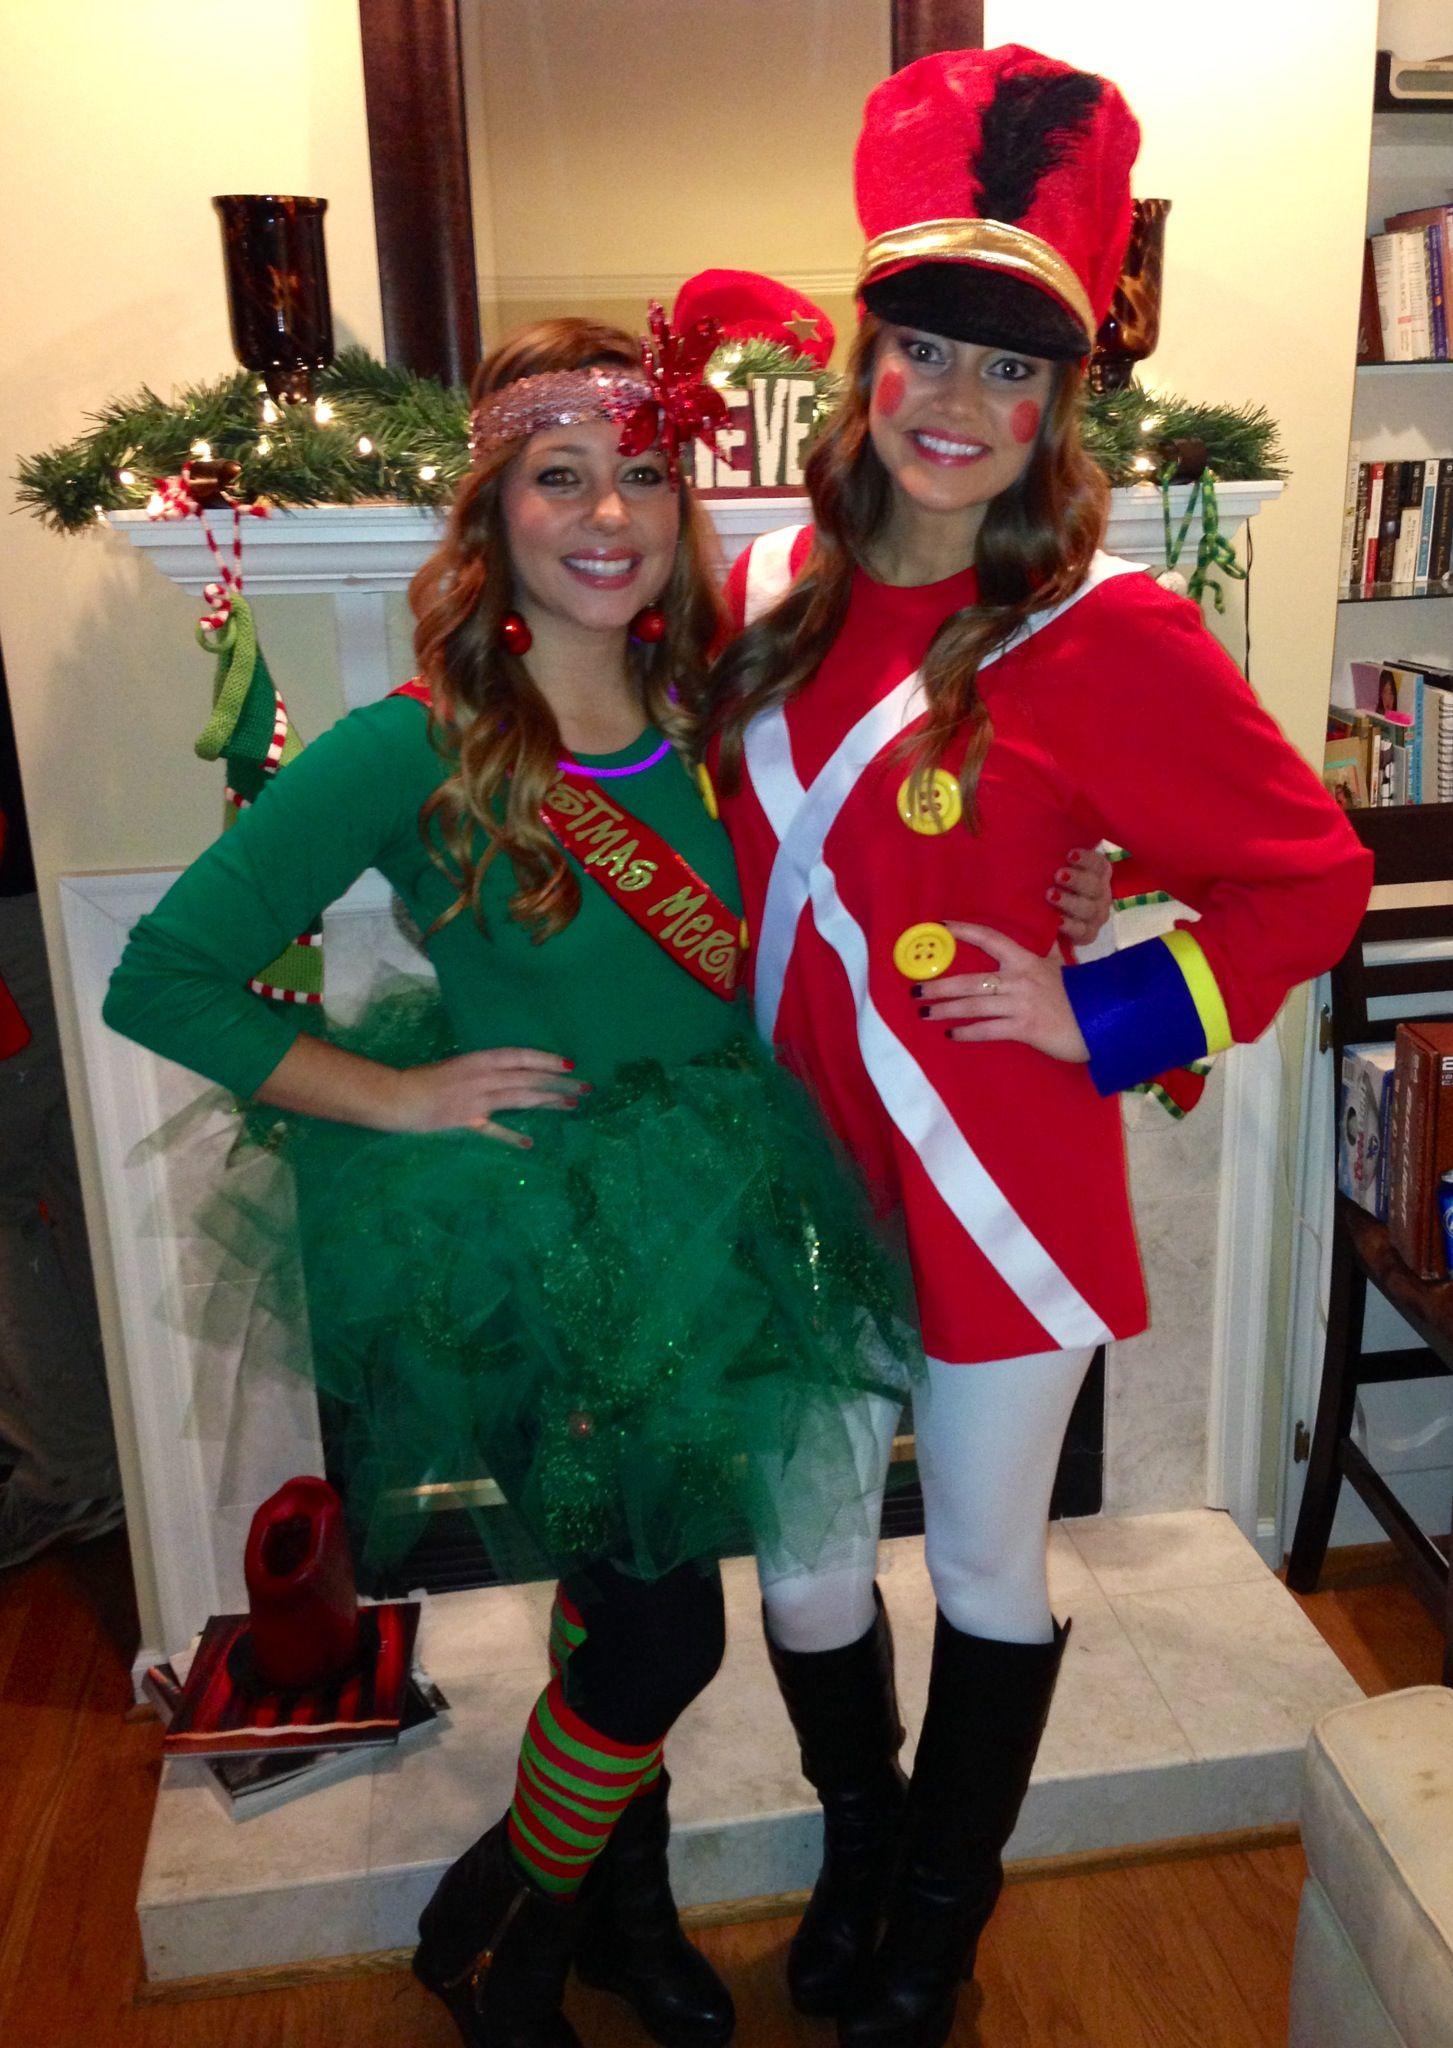 Fun Christmas party outfits | christmas | Pinterest | Christmas ...